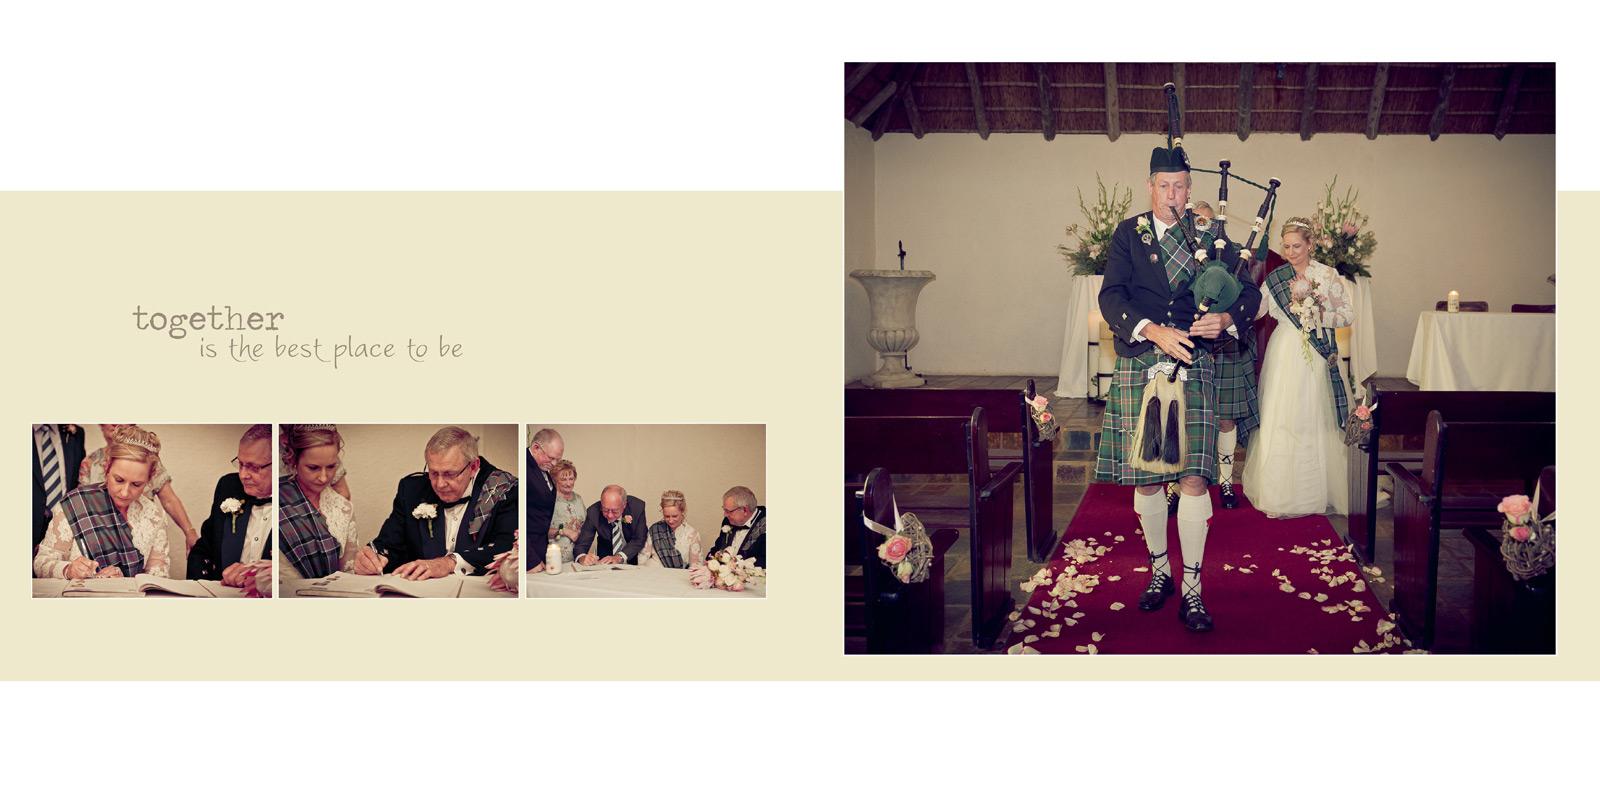 Nathalie Boucry Photography | Deidre and Lister Wedding Album 013